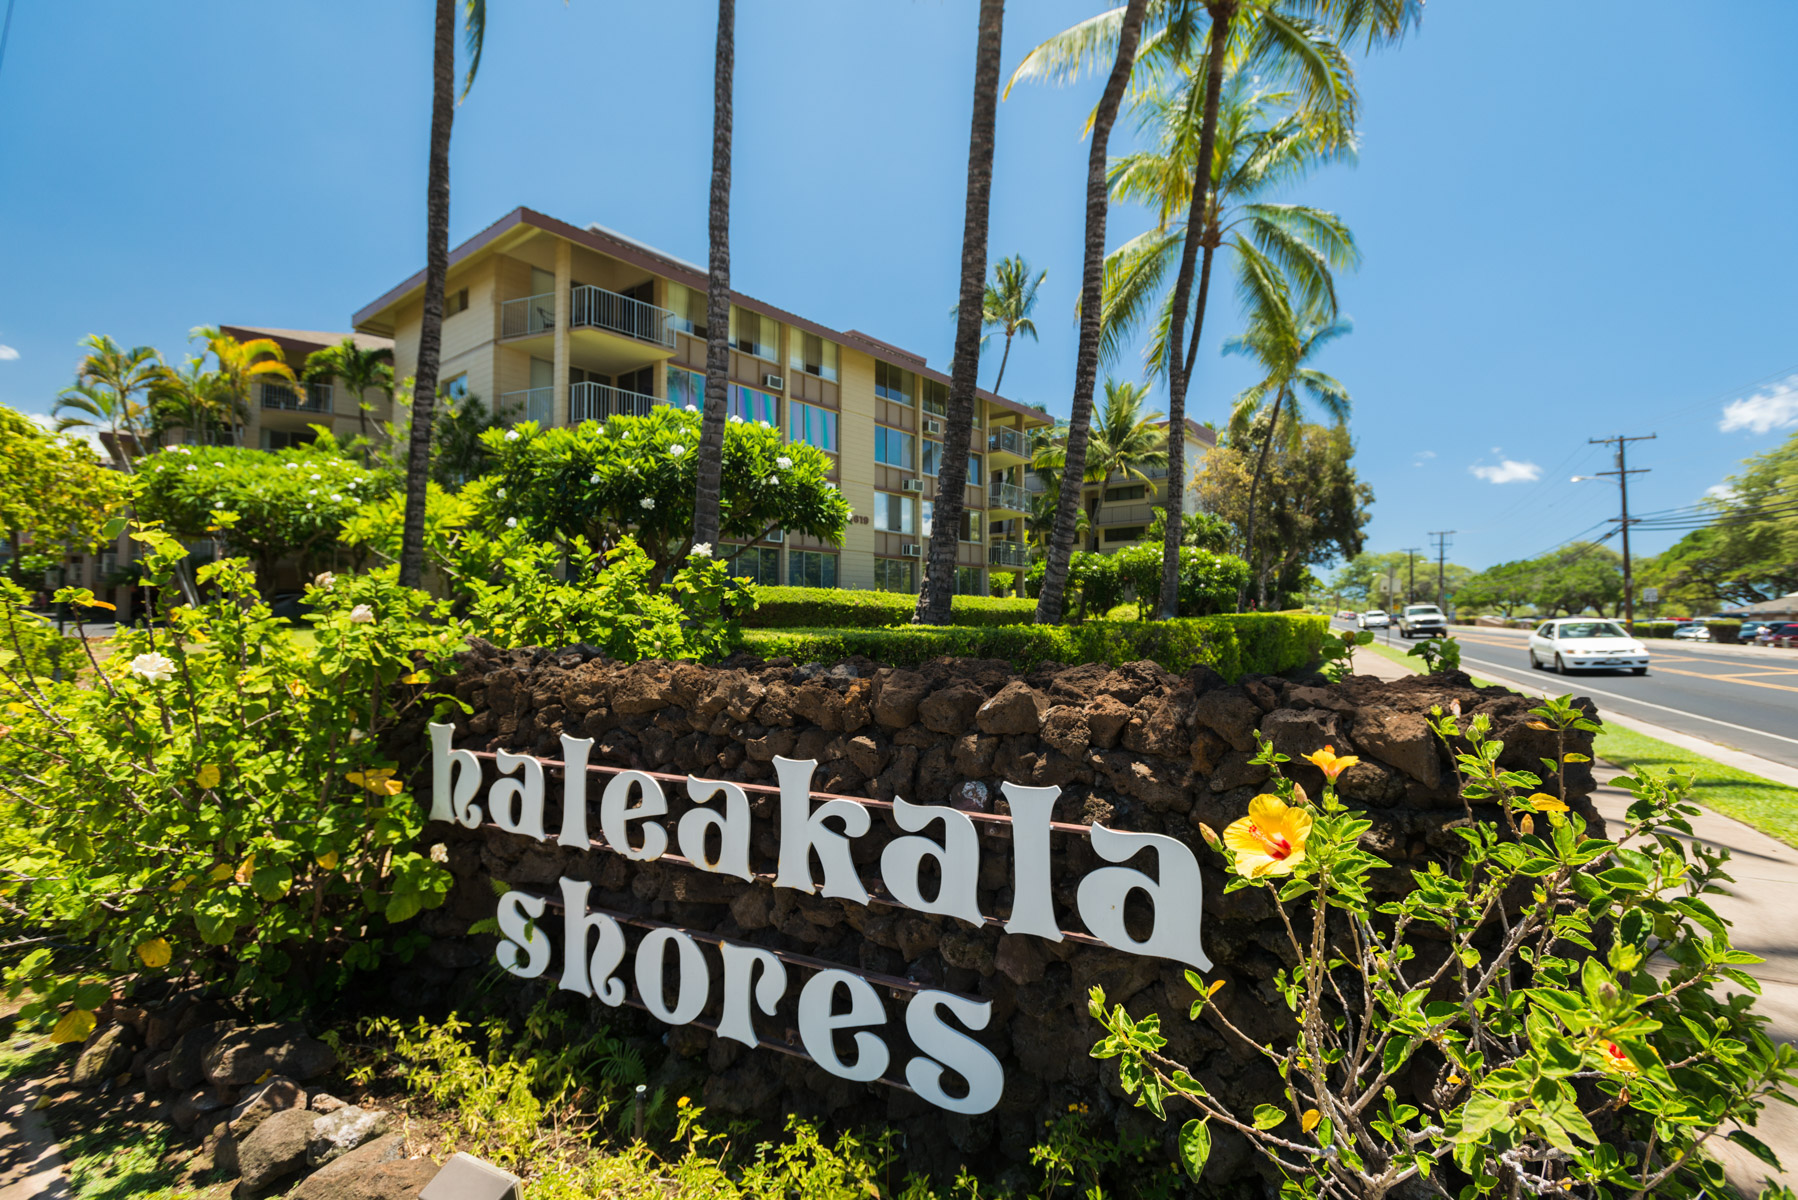 Haleakala Shores Condos